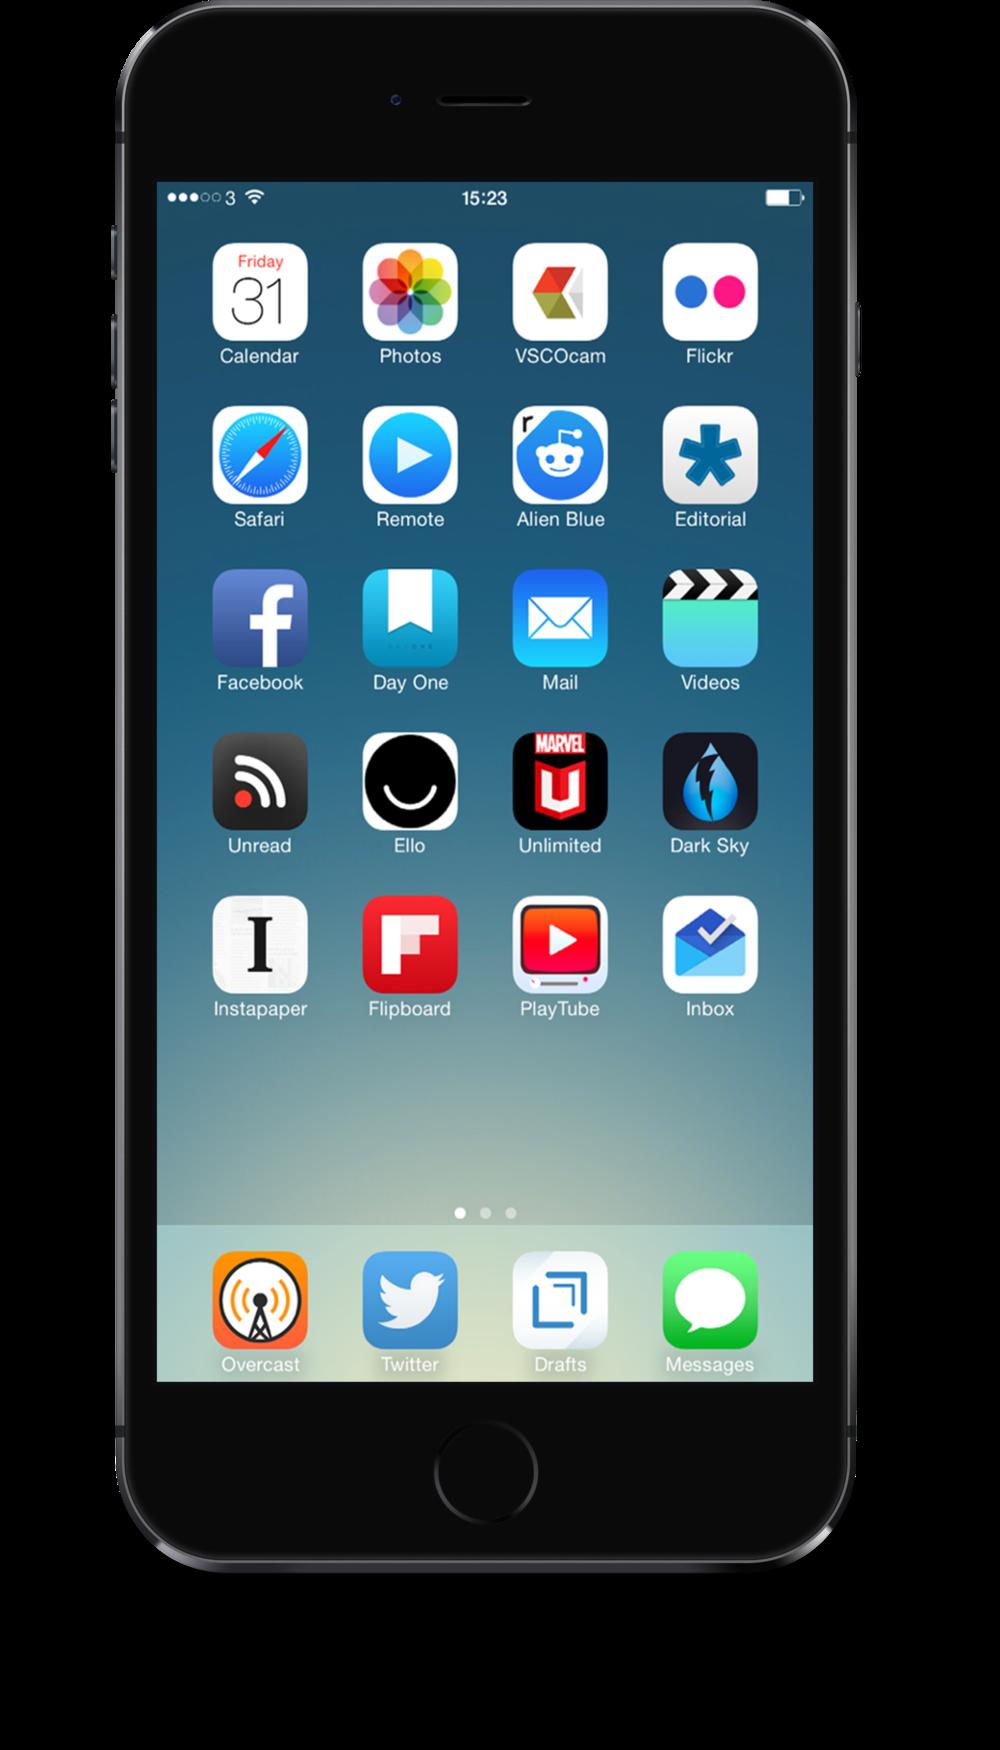 Homescreen-iPhone6Plus-Nov14